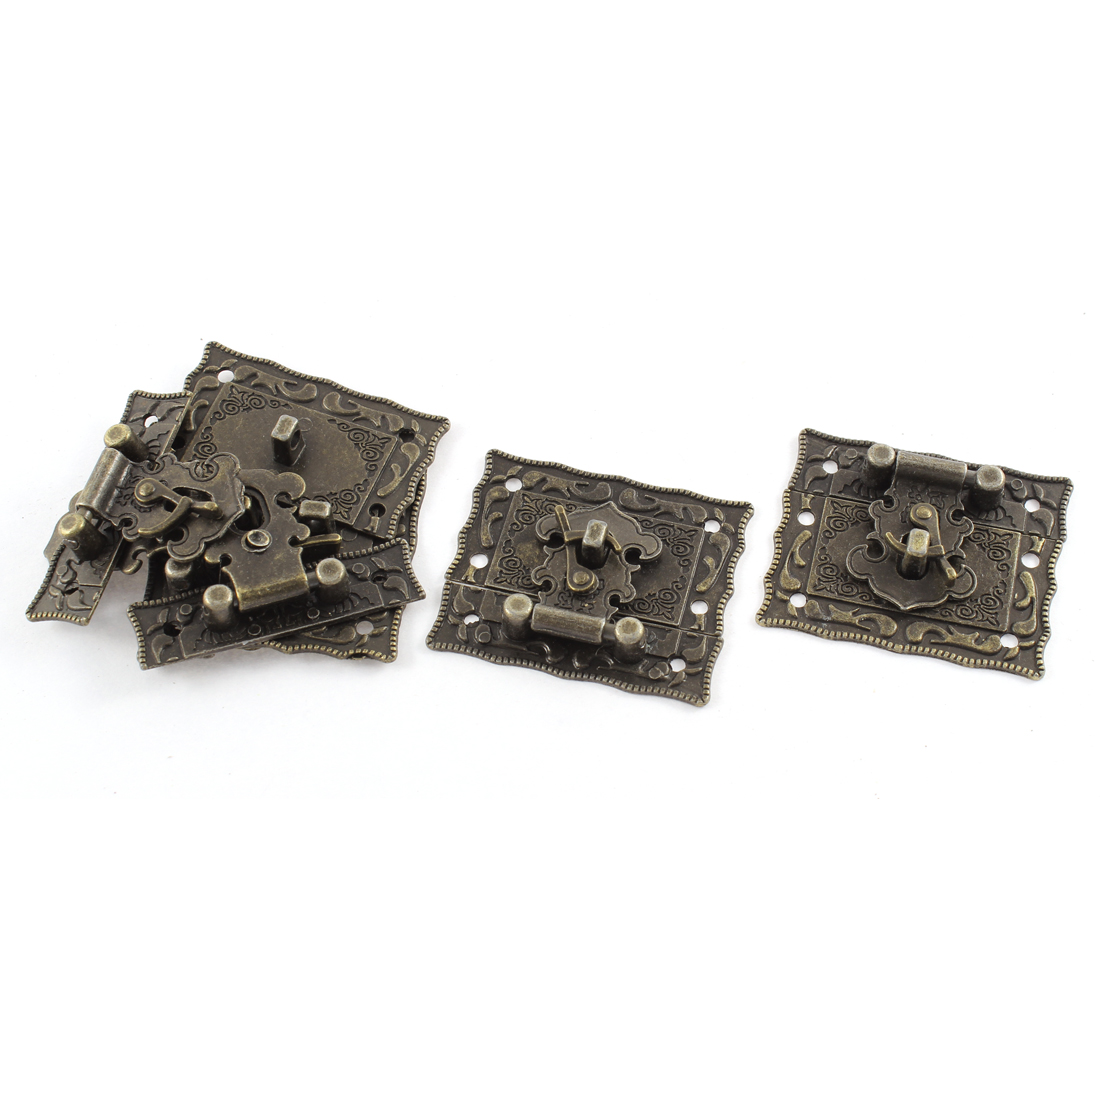 5pcs 51mmx43mm Antique Style Jewelry Box Hasp Latch Lock w Screws